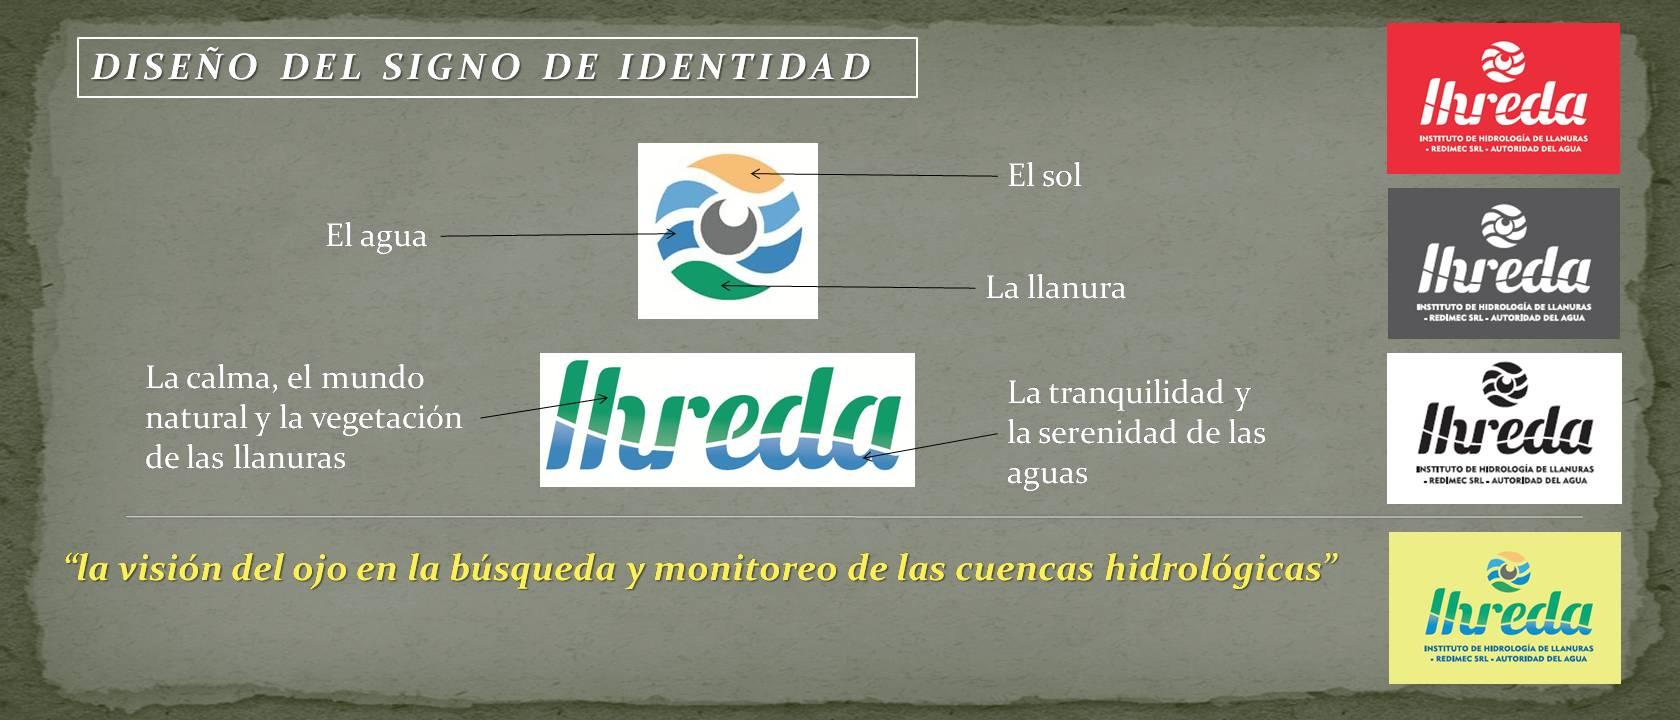 Identidad IHREDA